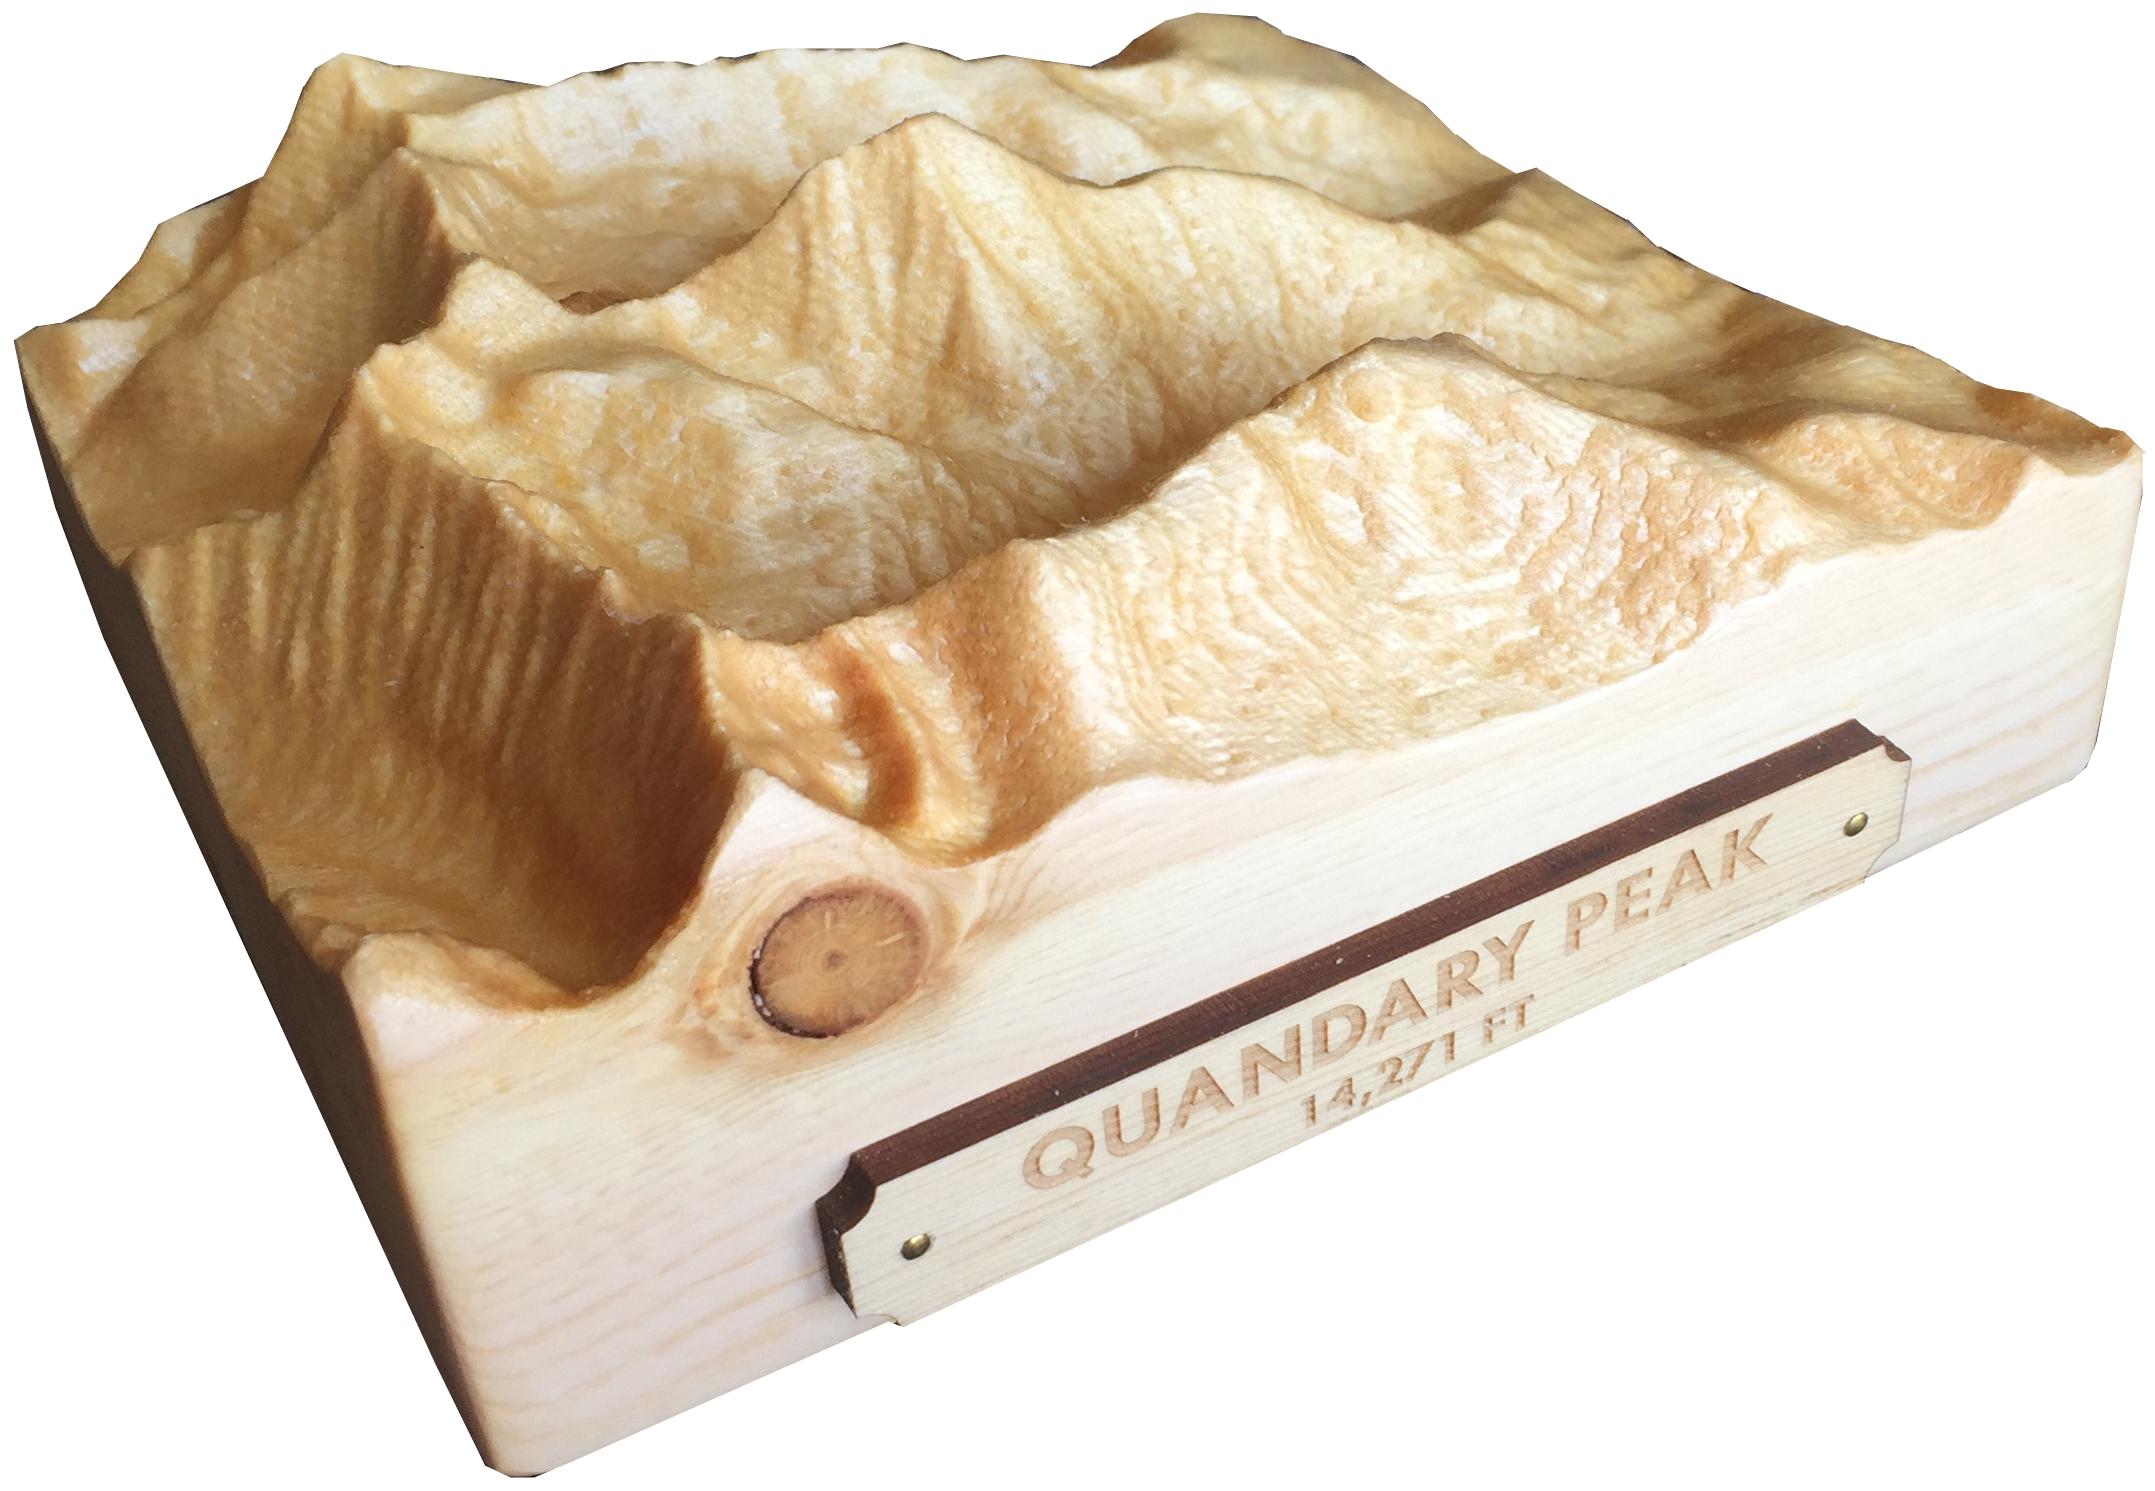 Quandary Gift Carving.jpg